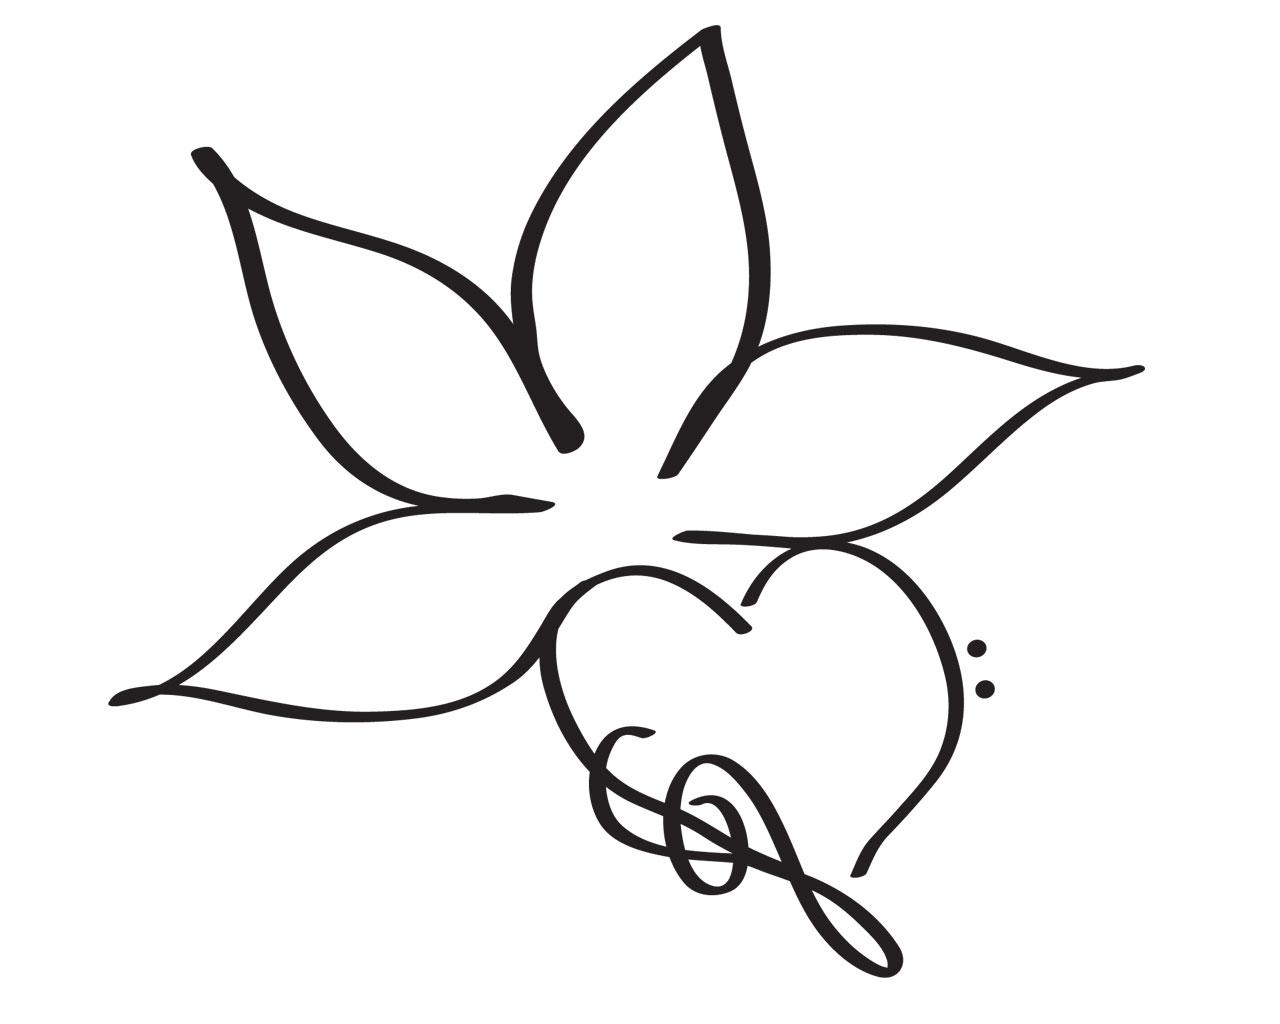 1280x1024 Tattoo Designs Simple Flower Design